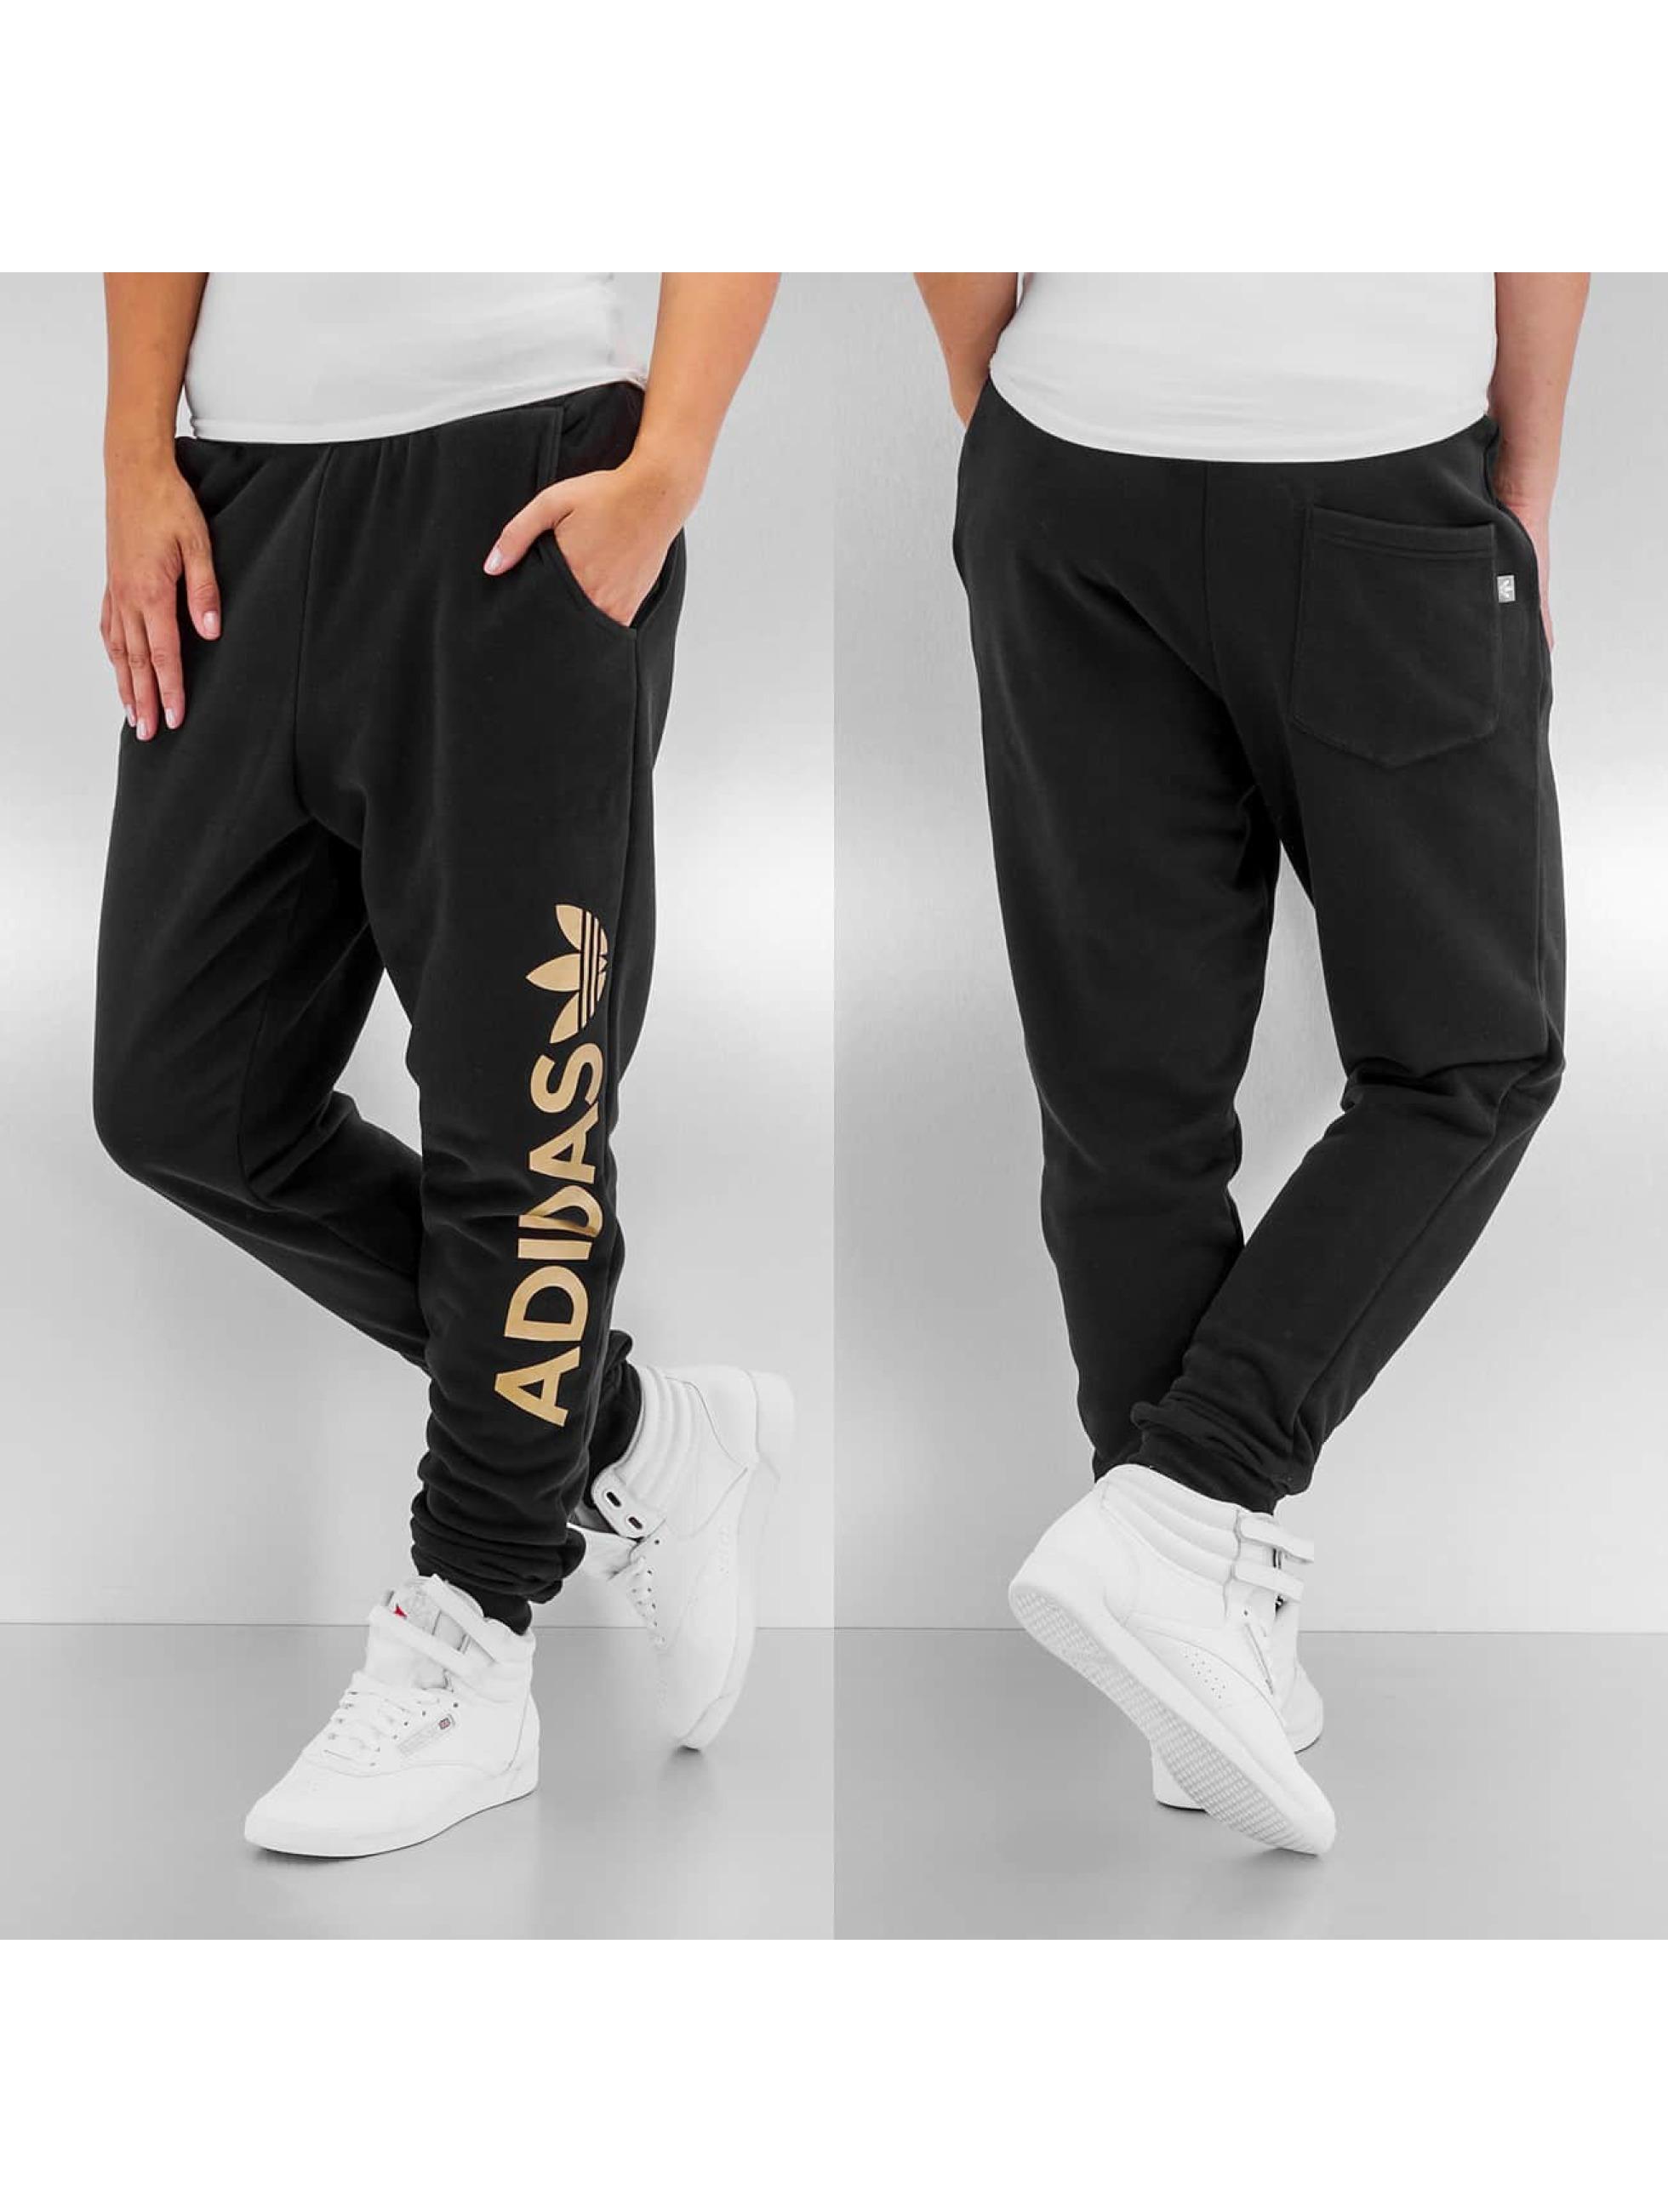 adidas damen jogginghose en baggy in schwarz 231167. Black Bedroom Furniture Sets. Home Design Ideas